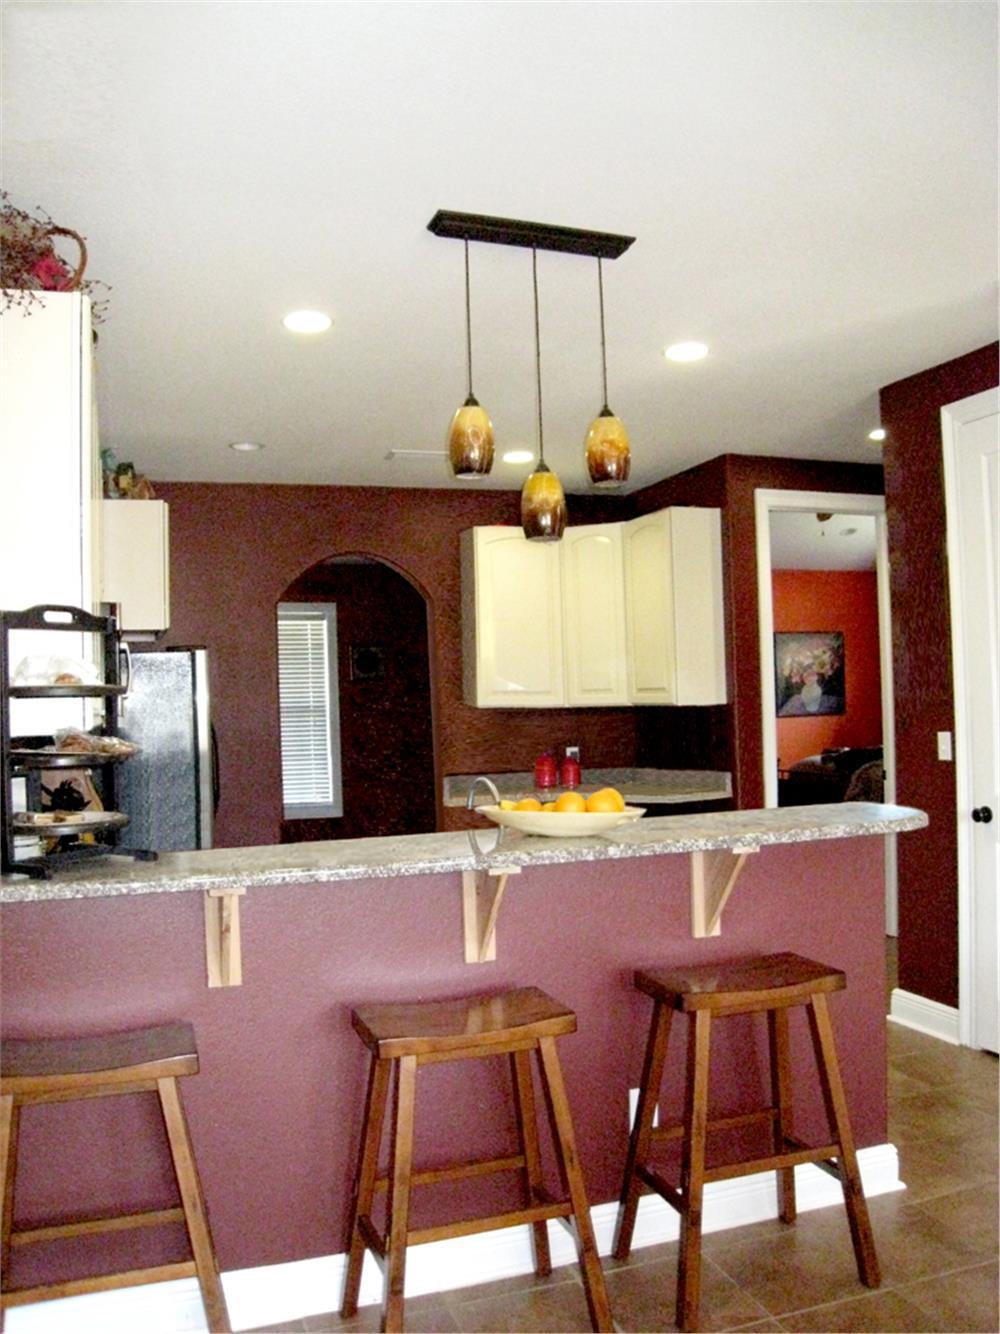 123-1032: Home Interior Photograph